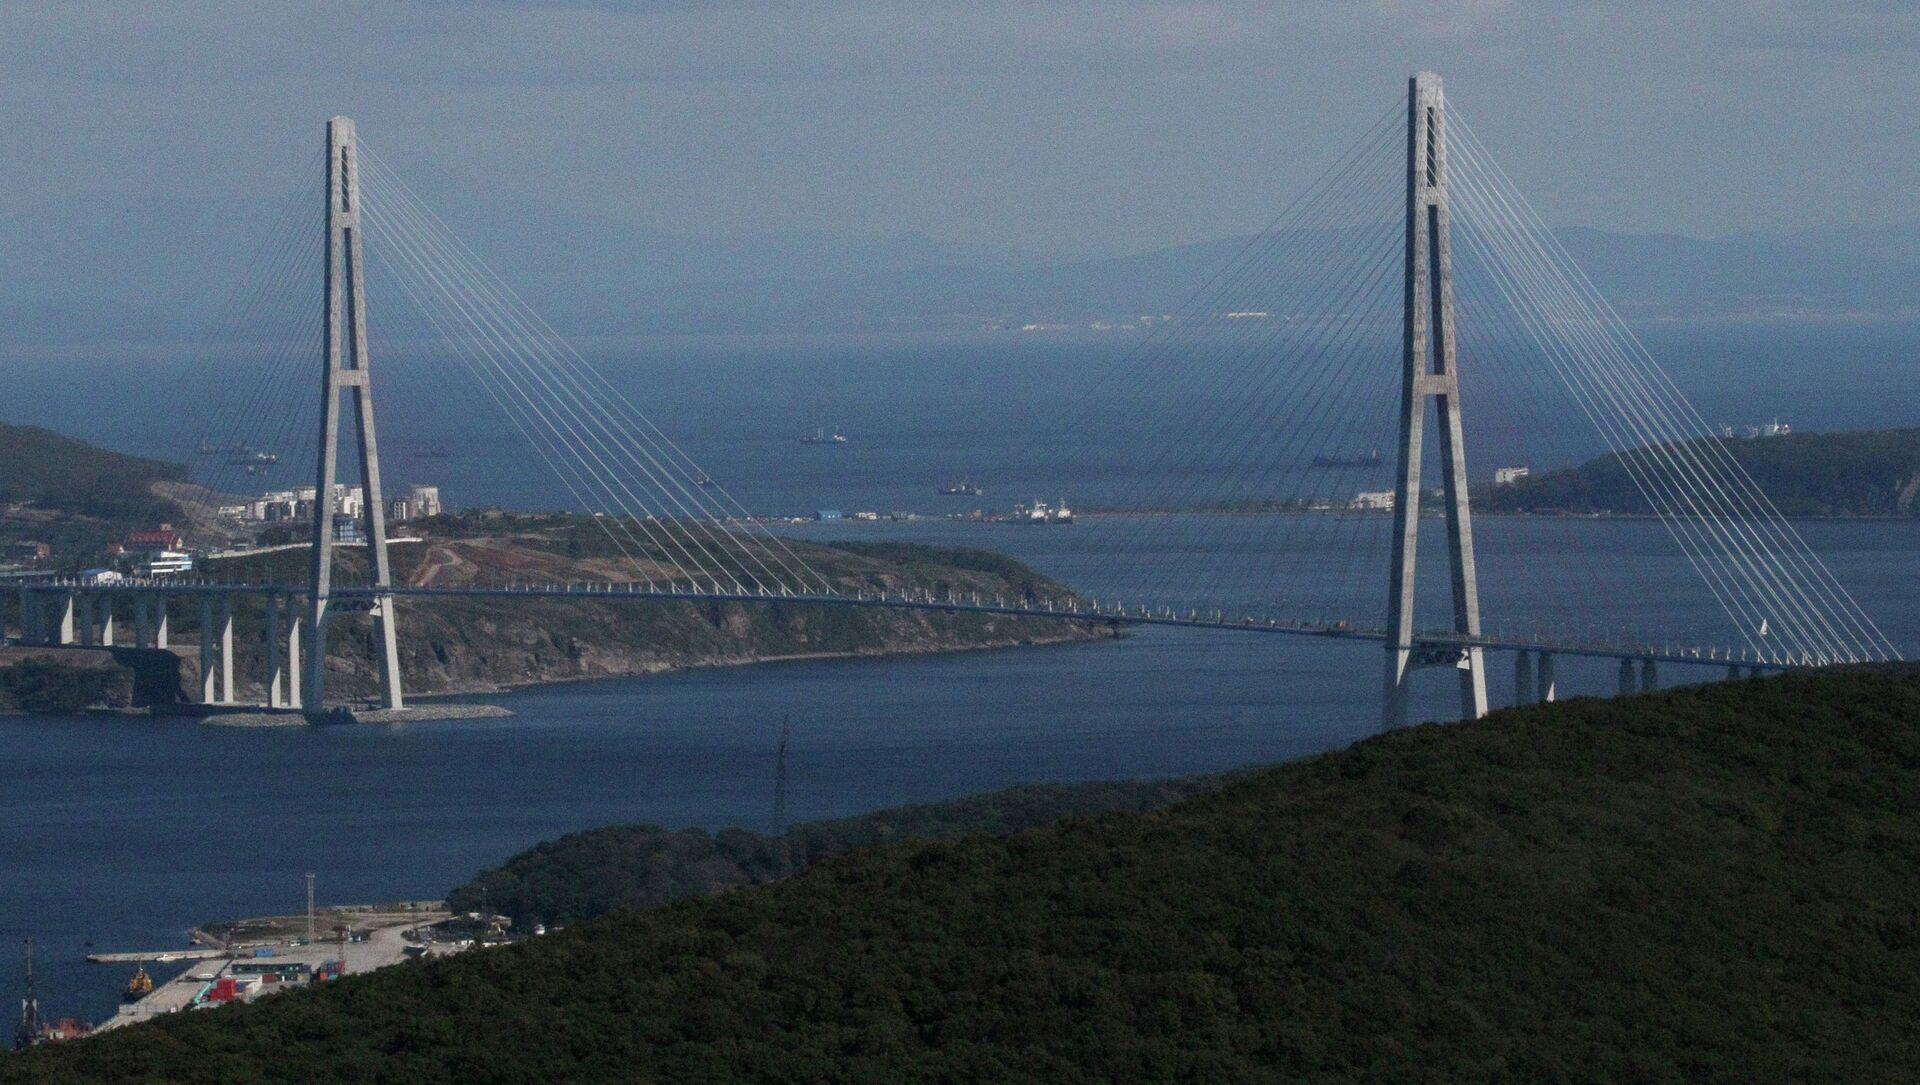 A cable bridge over the Eastern Bosphorus strait on Russky Island in Vladivostok - Sputnik International, 1920, 01.09.2021